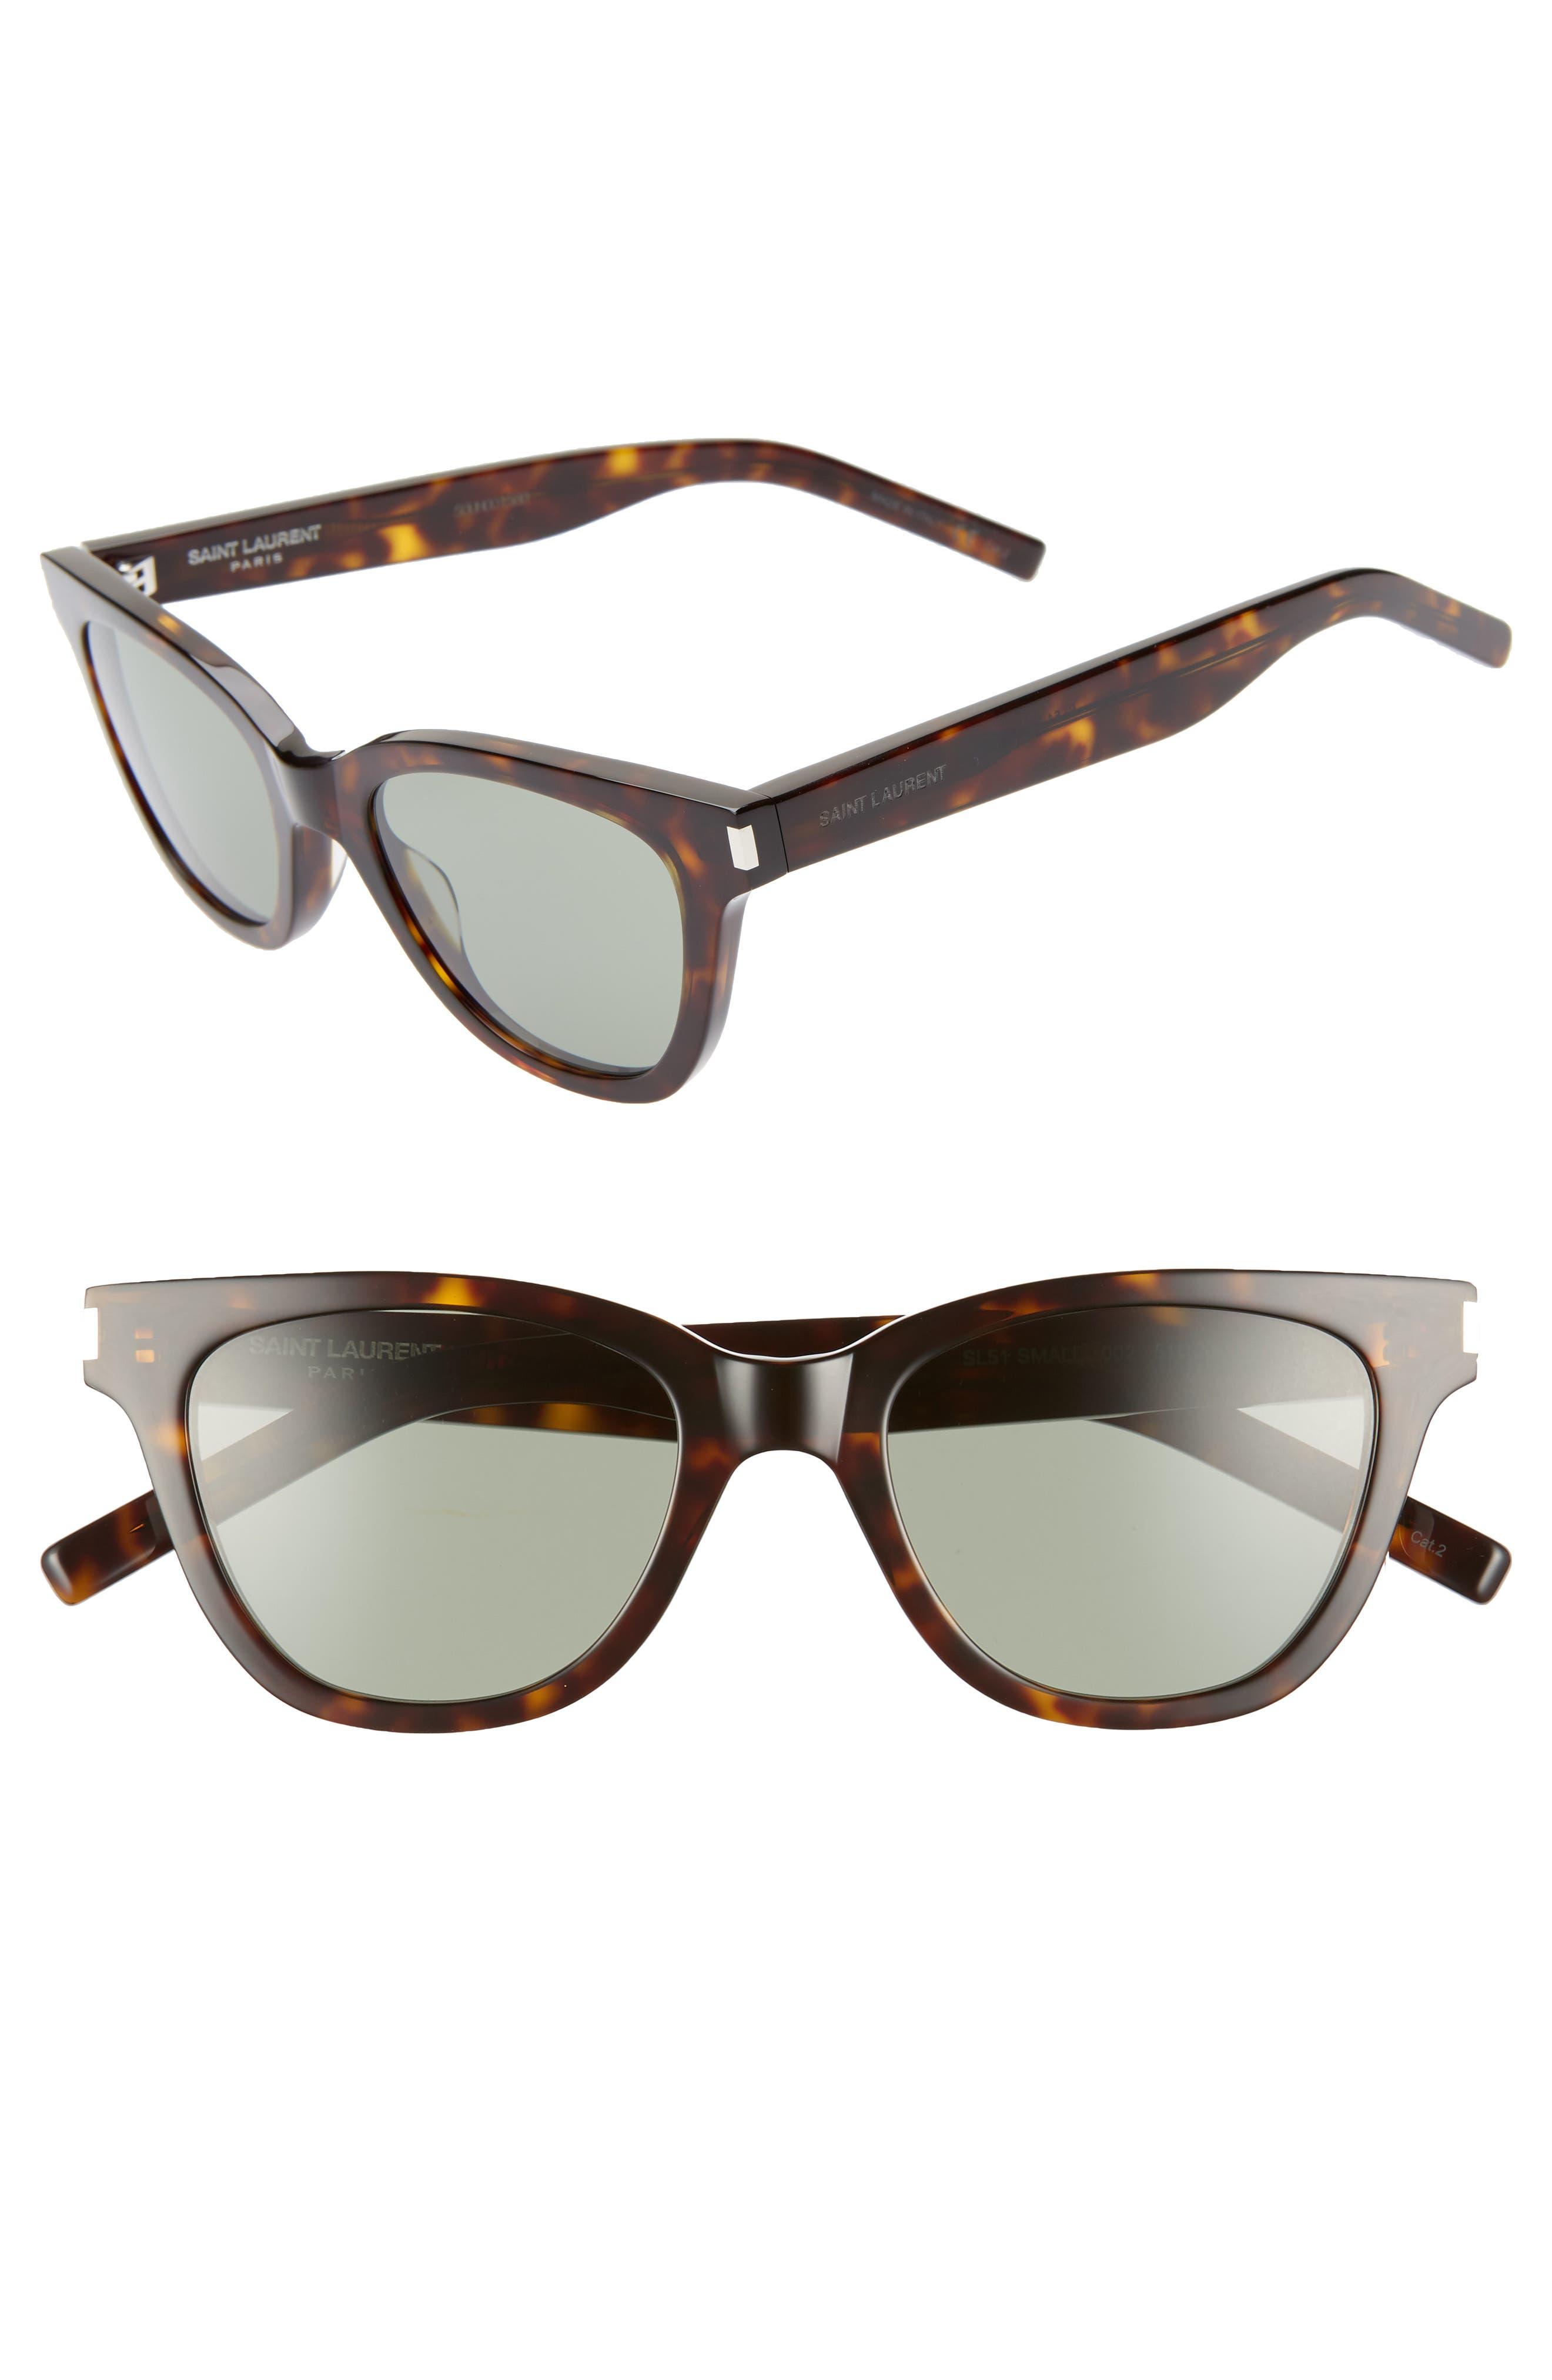 51mm Cat Eye Sunglasses,                             Main thumbnail 1, color,                             DARK HAVANA/ GREEN